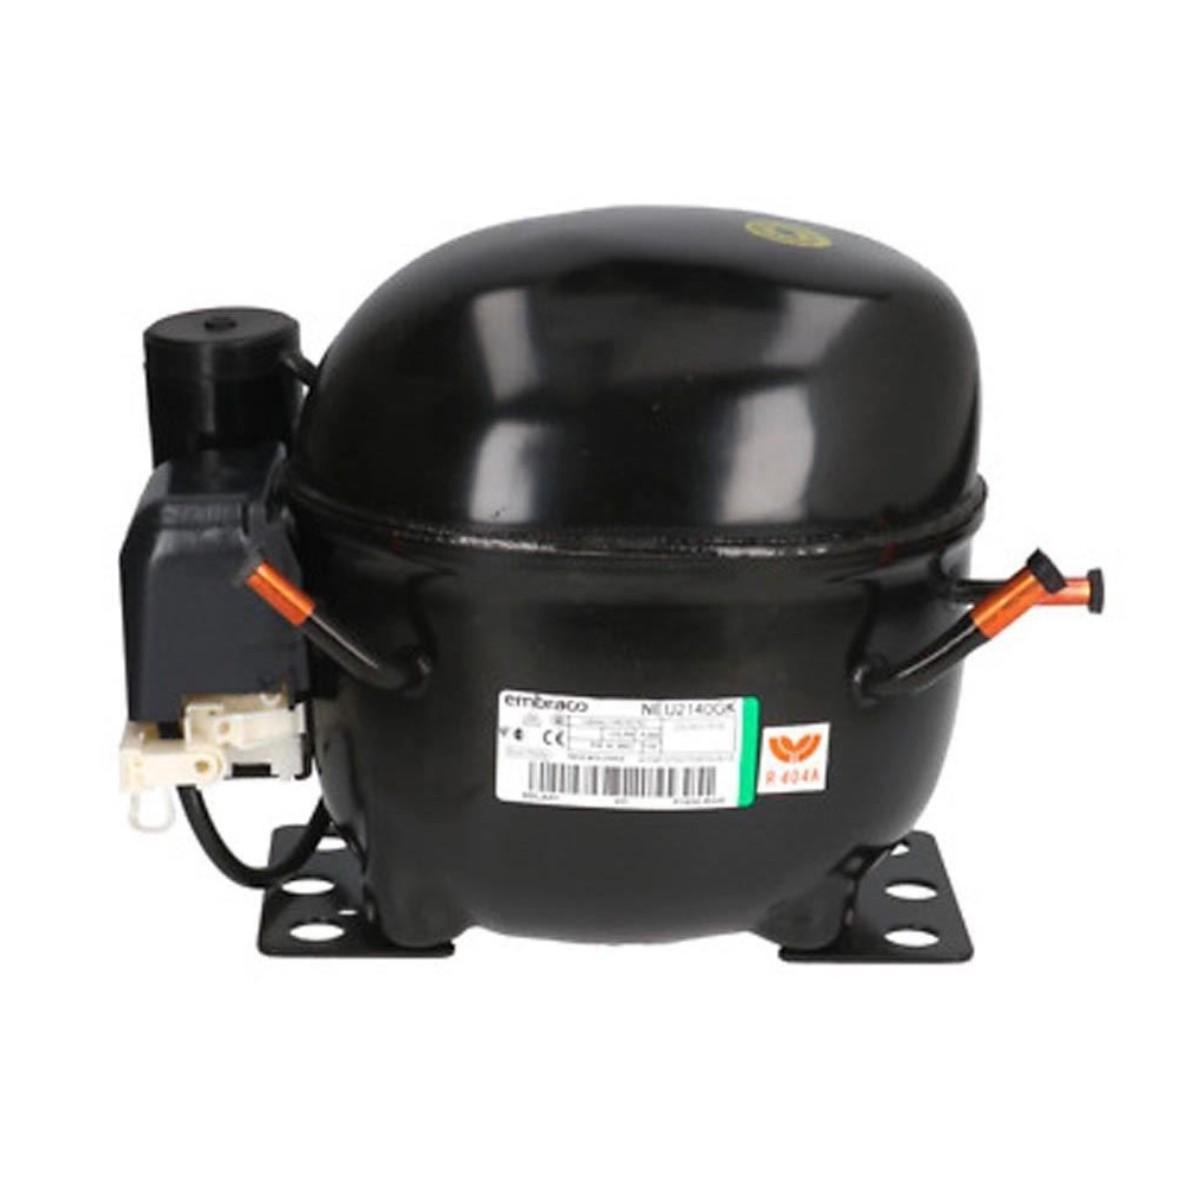 COMPRESSOR 1/2HP R404 220V 1F EMBRACO ASPERA NEU2140GK